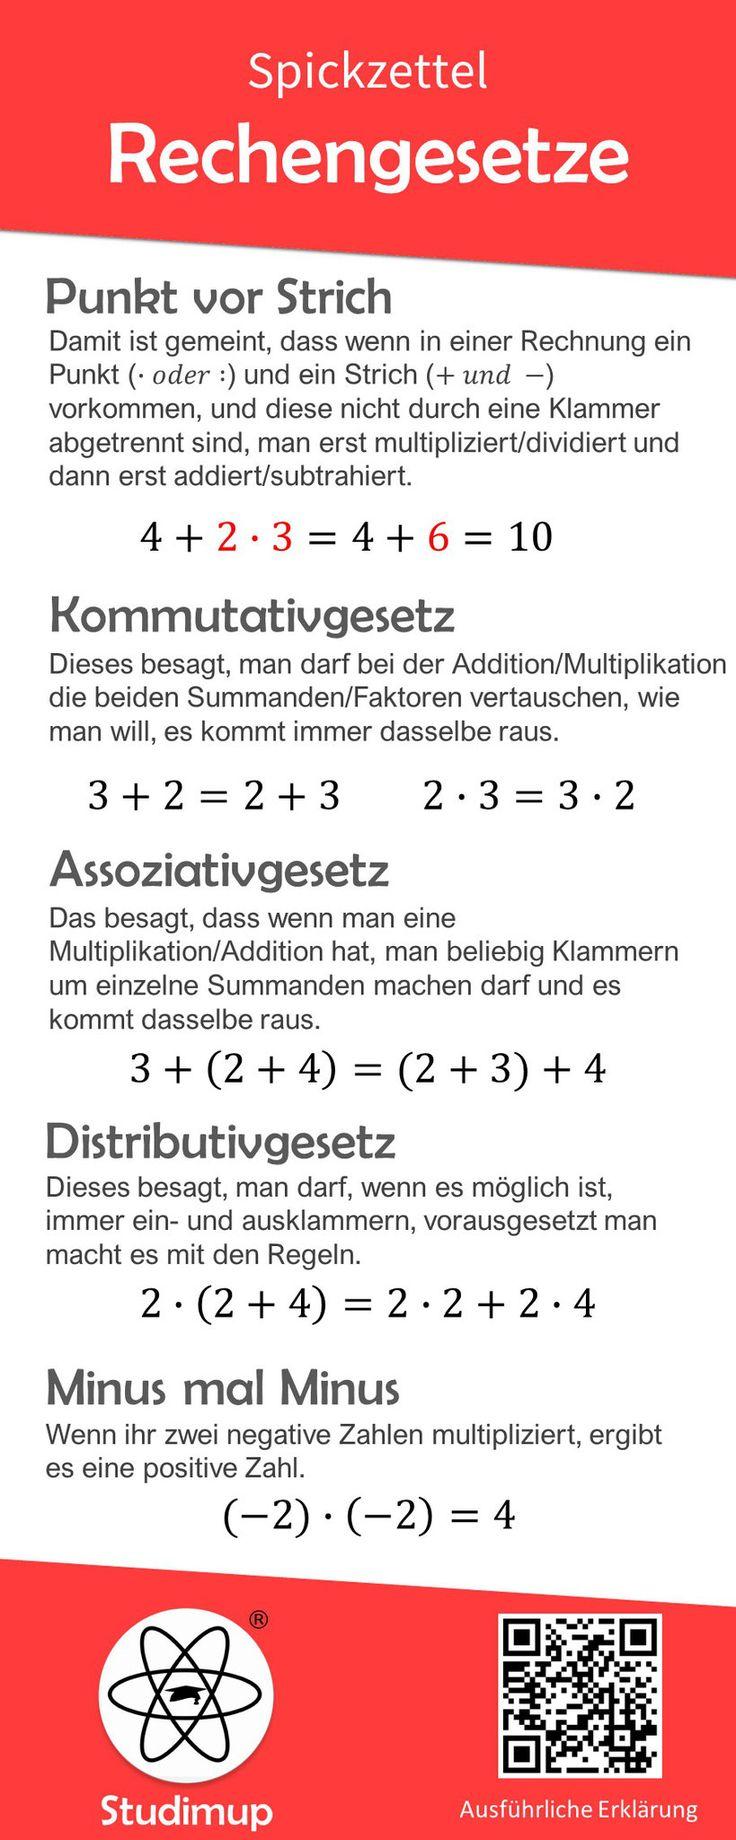 Mathe Spickzettel – Studimup.de